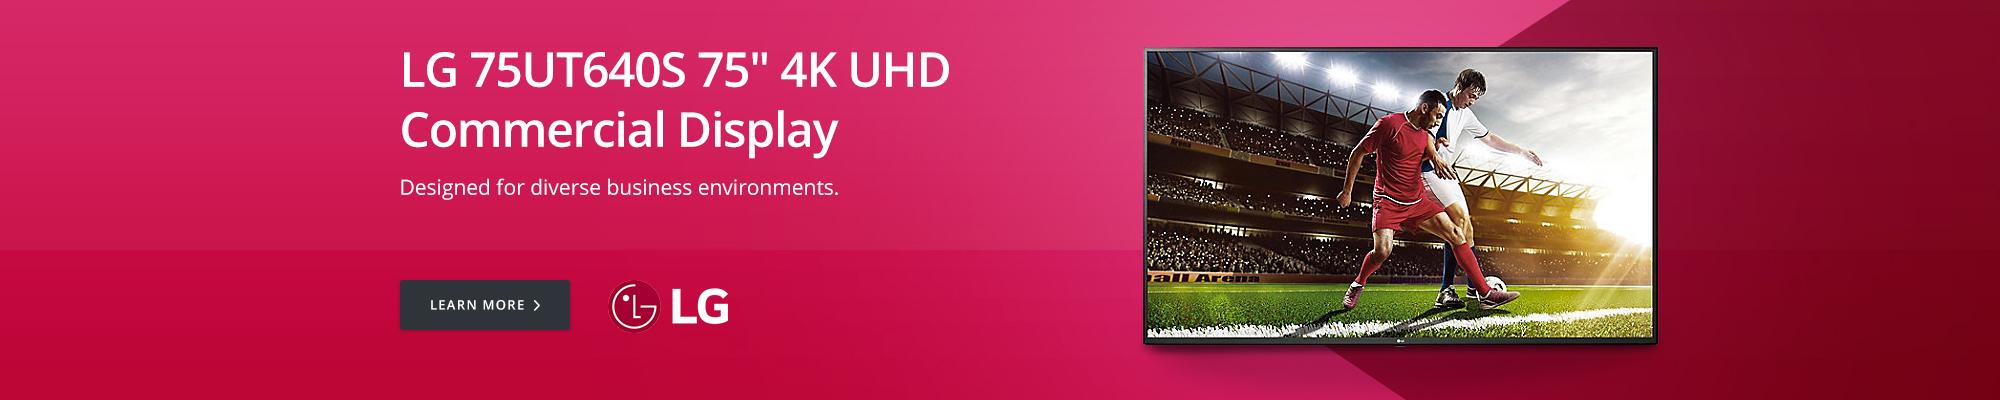 LG 75UT640S 75in 4K UHD Commercial Display